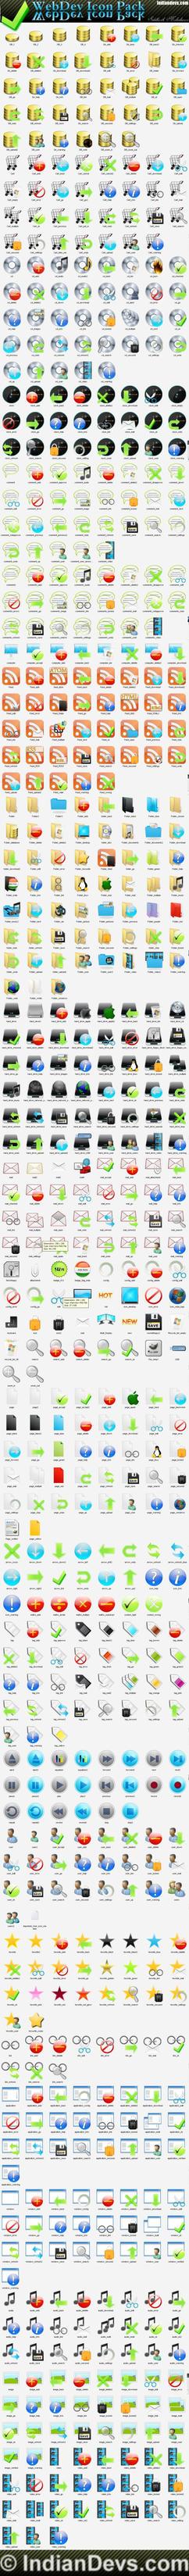 WebDev Icon Pack by SiddharthMaheshwari